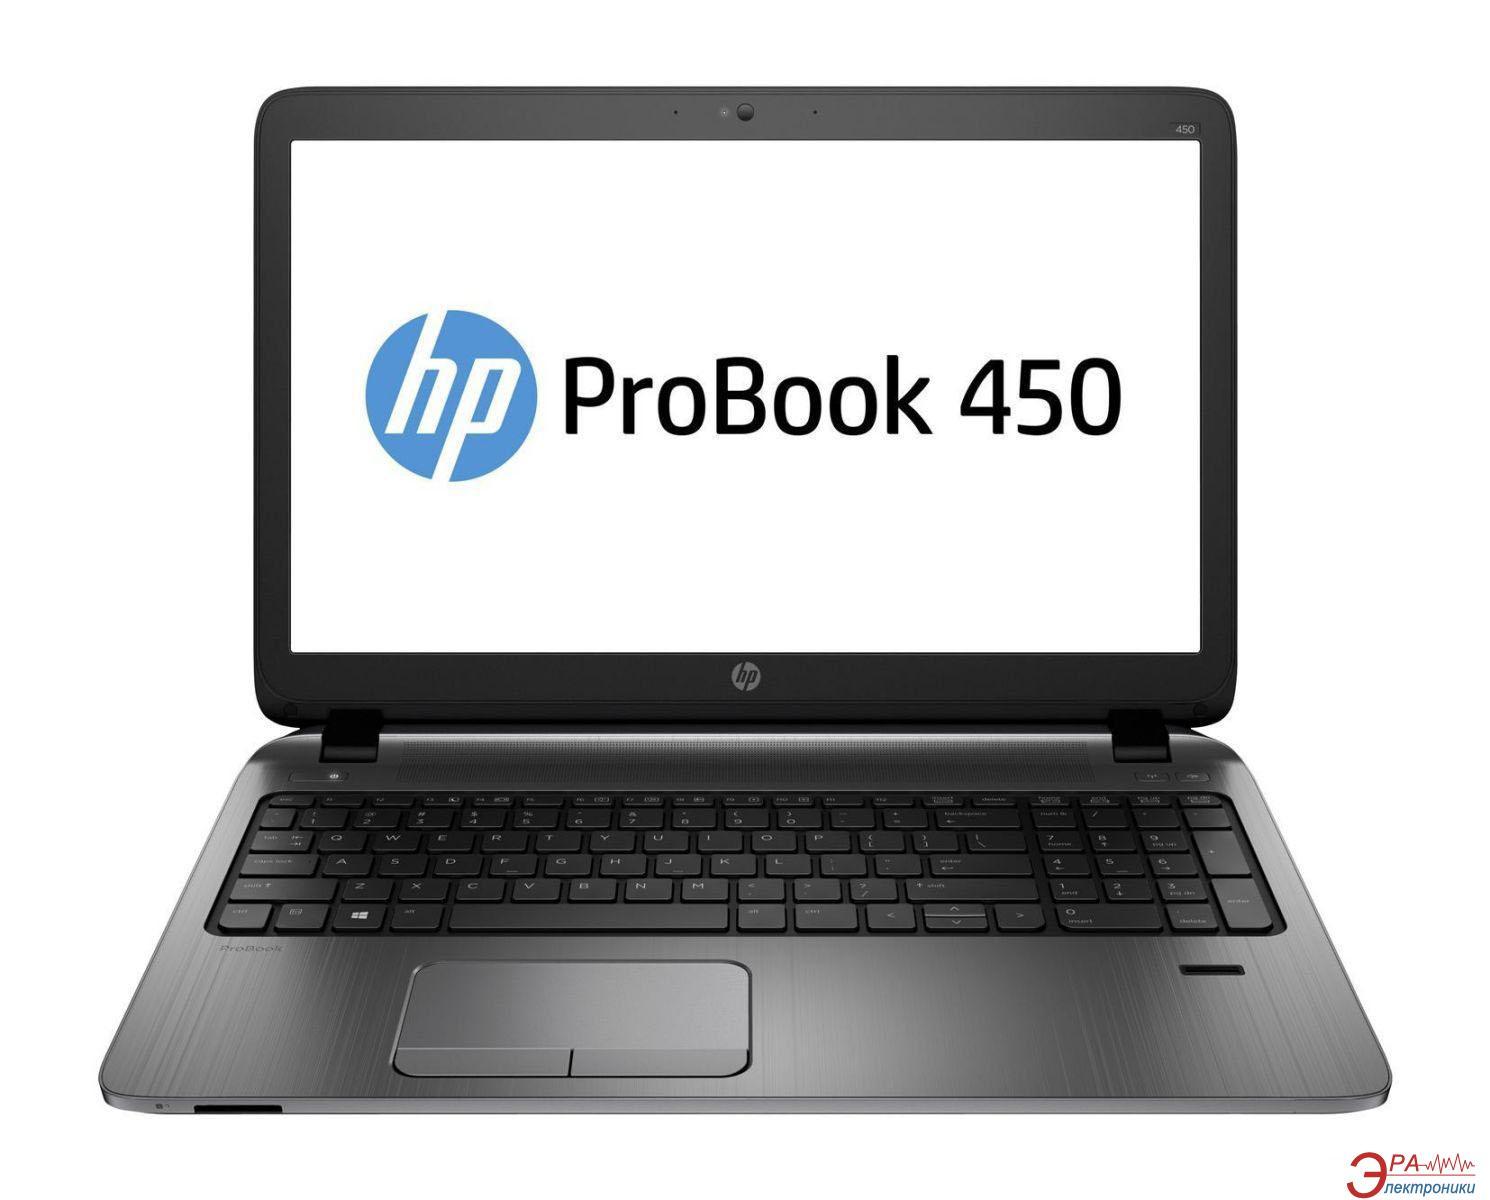 Ноутбук HP ProBook 450 (X0Q67ES) Grey 15,6